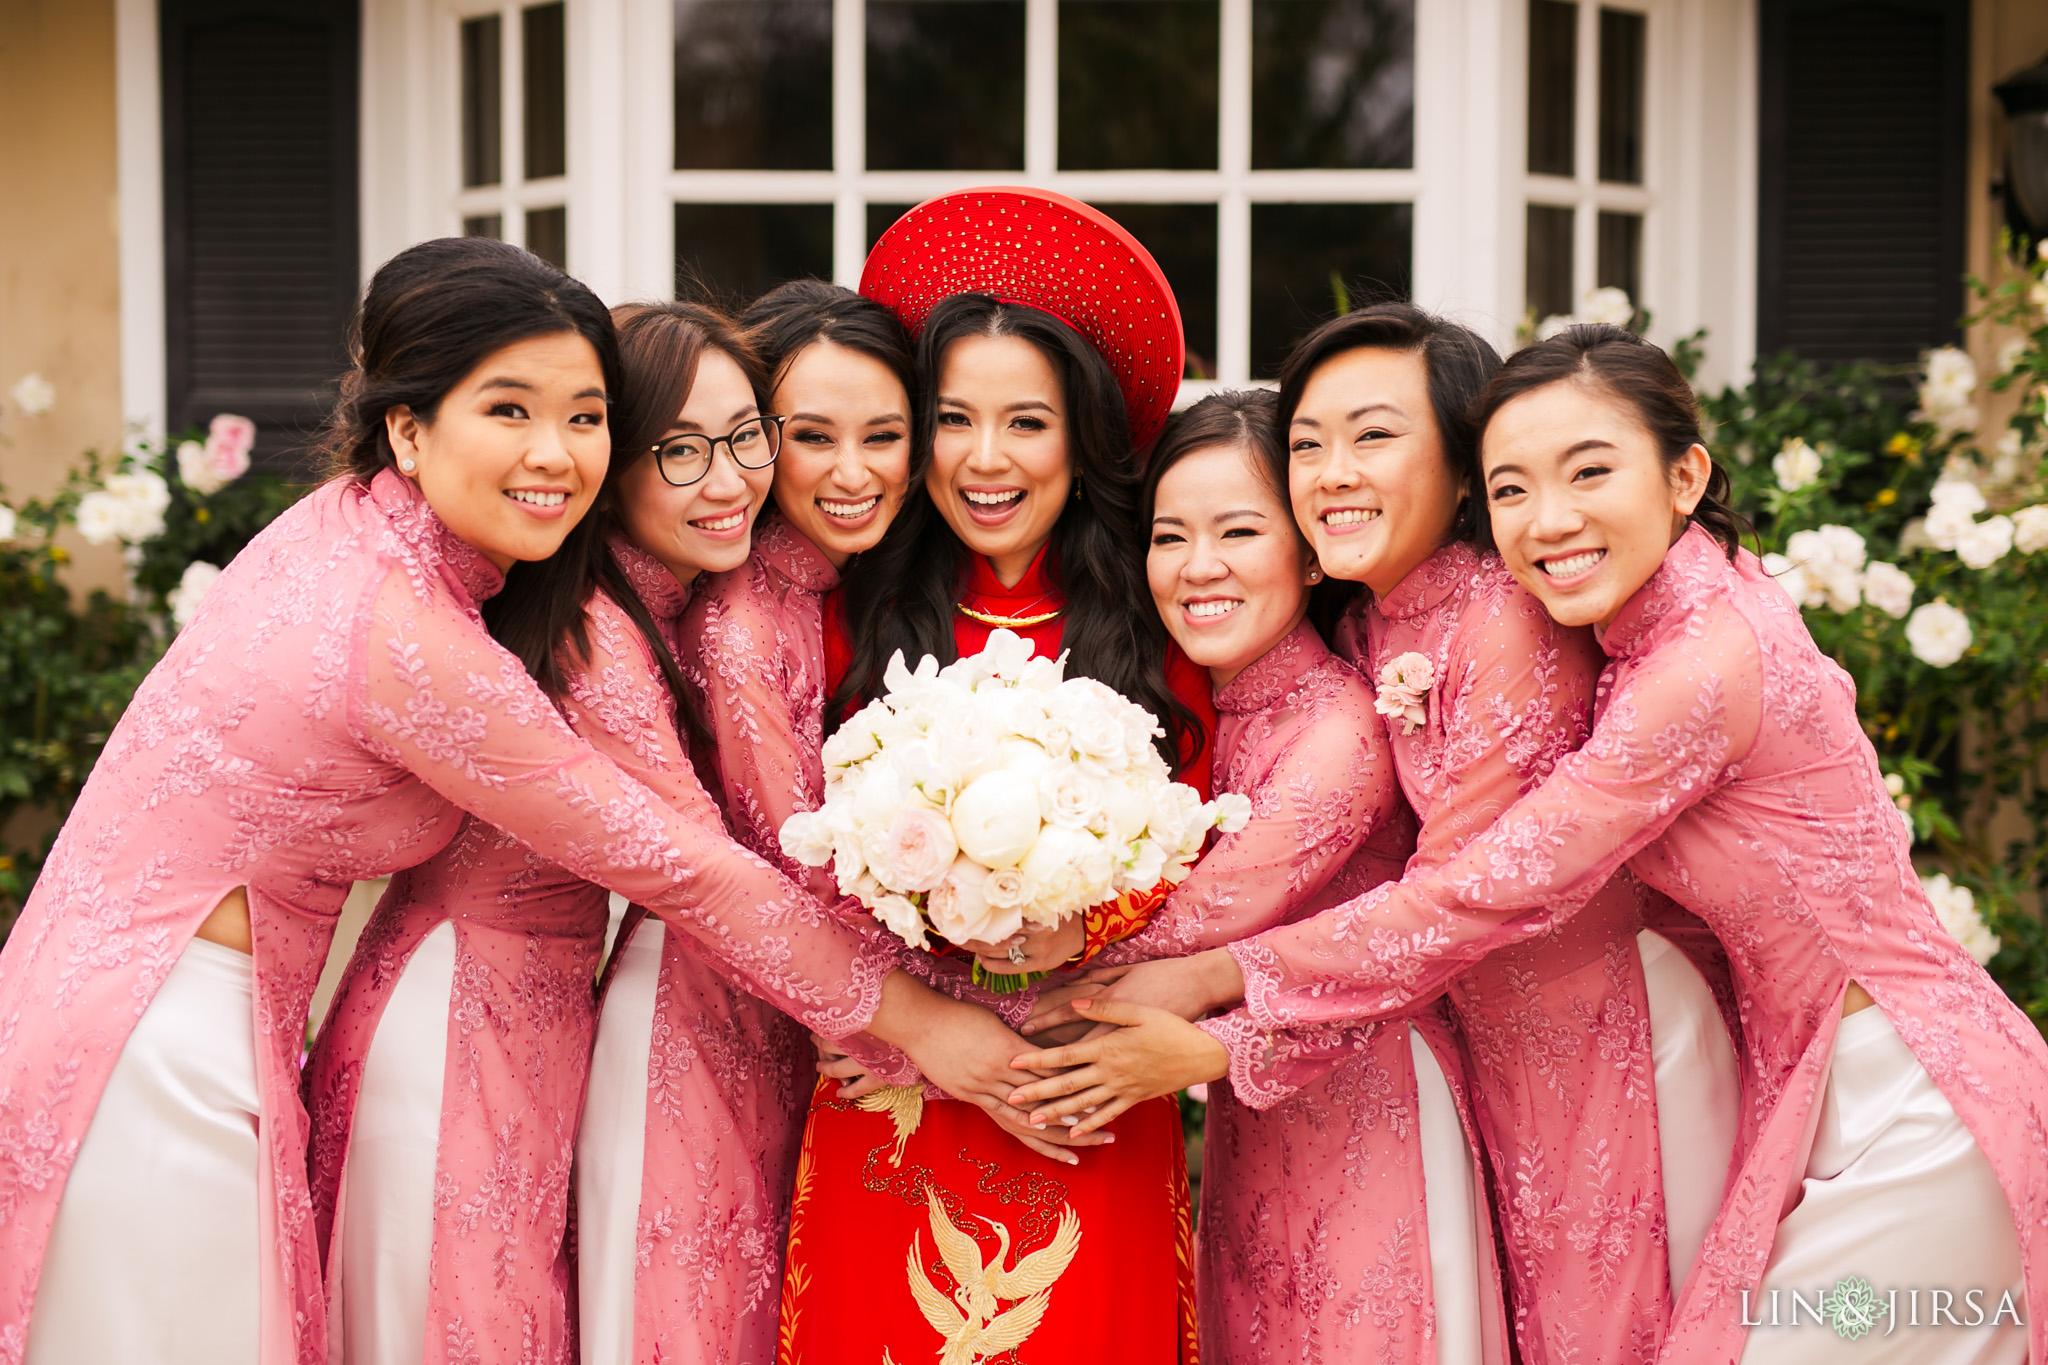 003 orange county vietnamese wedding photography